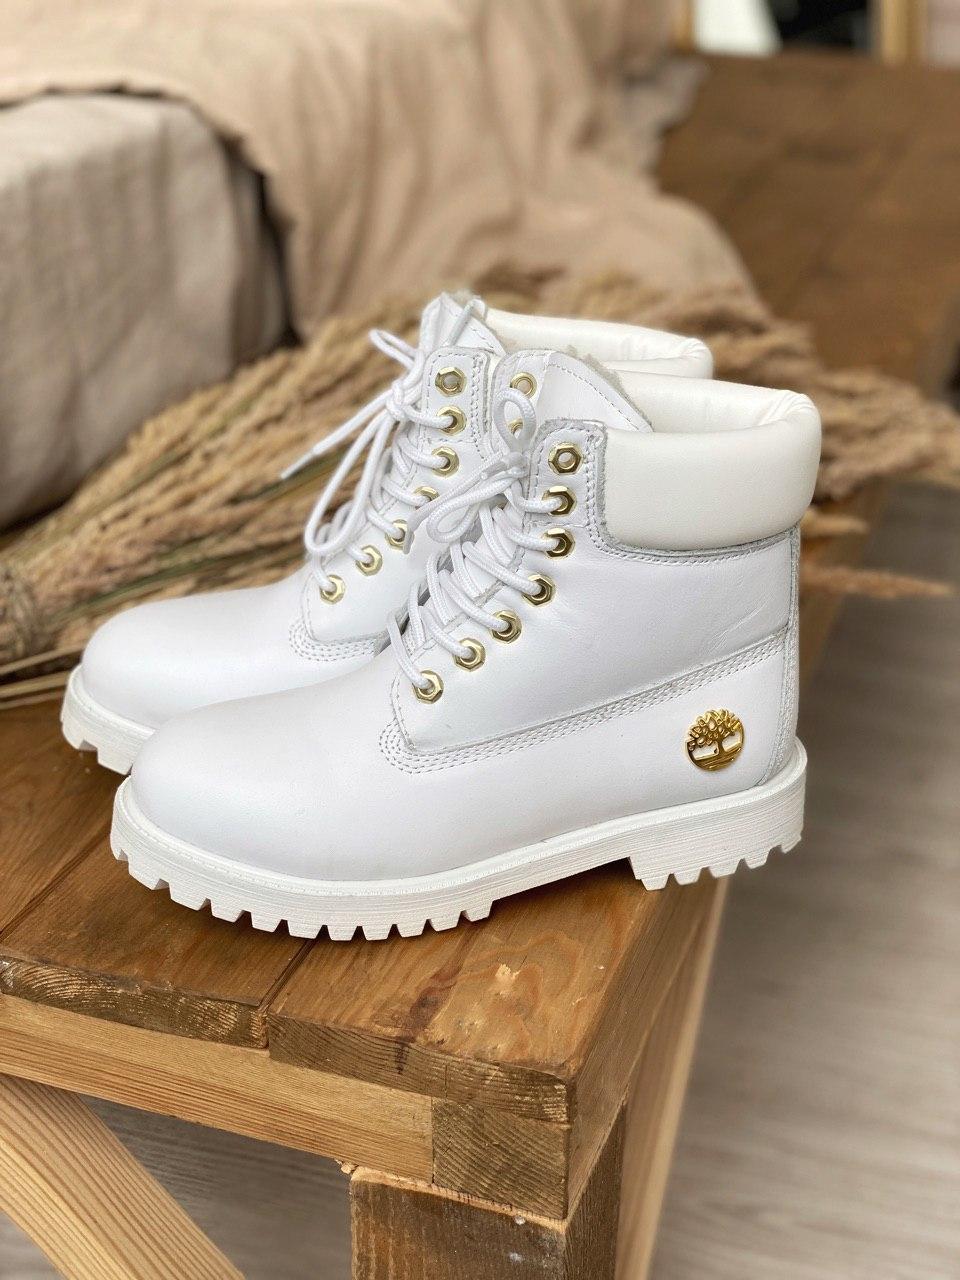 Ботинки женские Timberland 6 inch premium white ber тимберленд